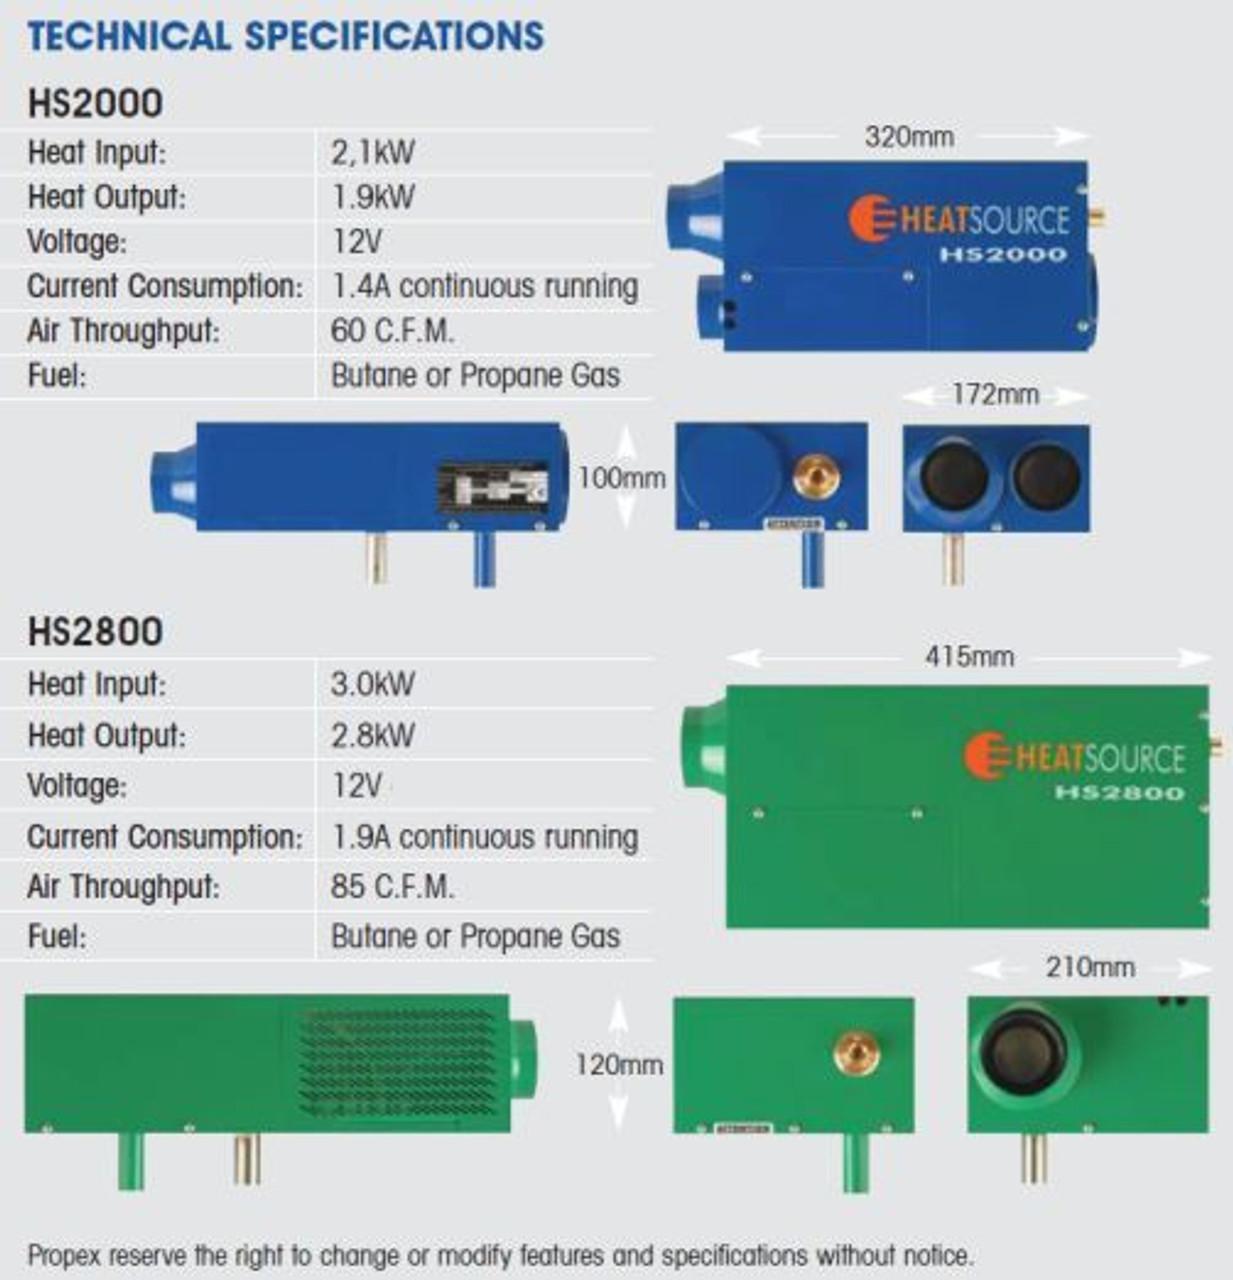 Propex Heatsource HS2000 12v LPG Gas Blown Air Heater